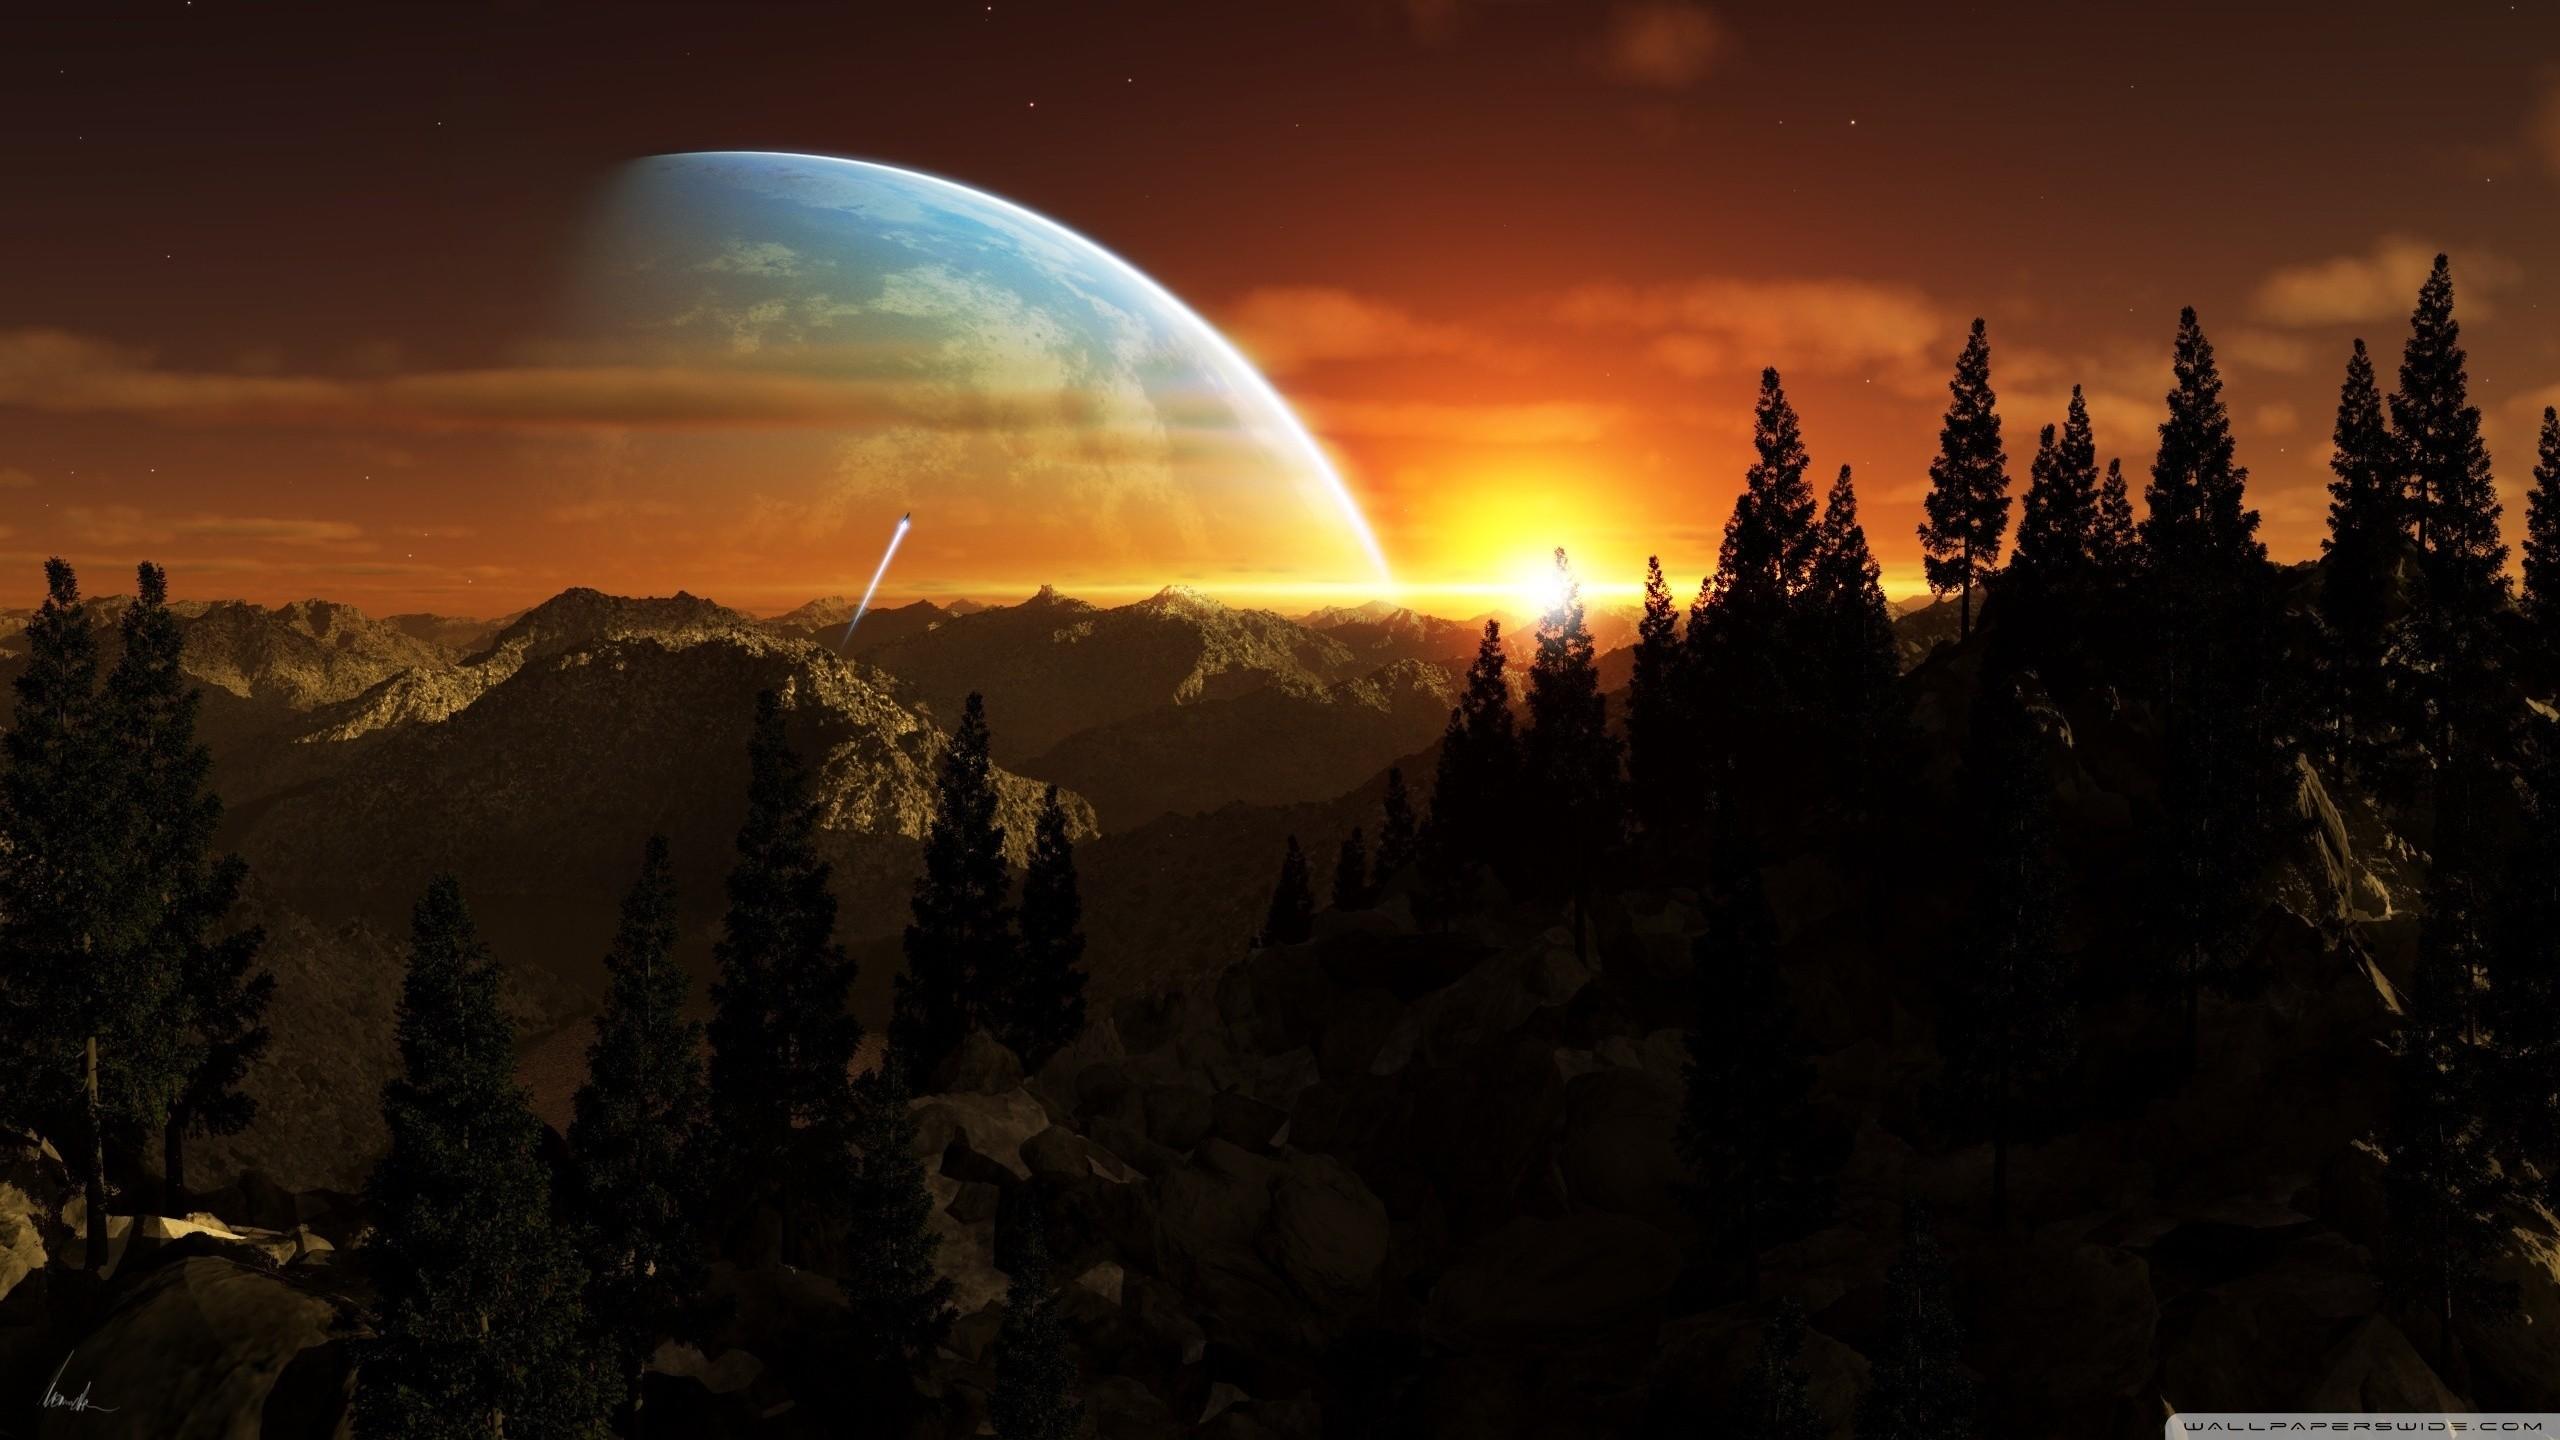 Best Future City 3d Wallpapers Alien World Wallpaper 78 Images